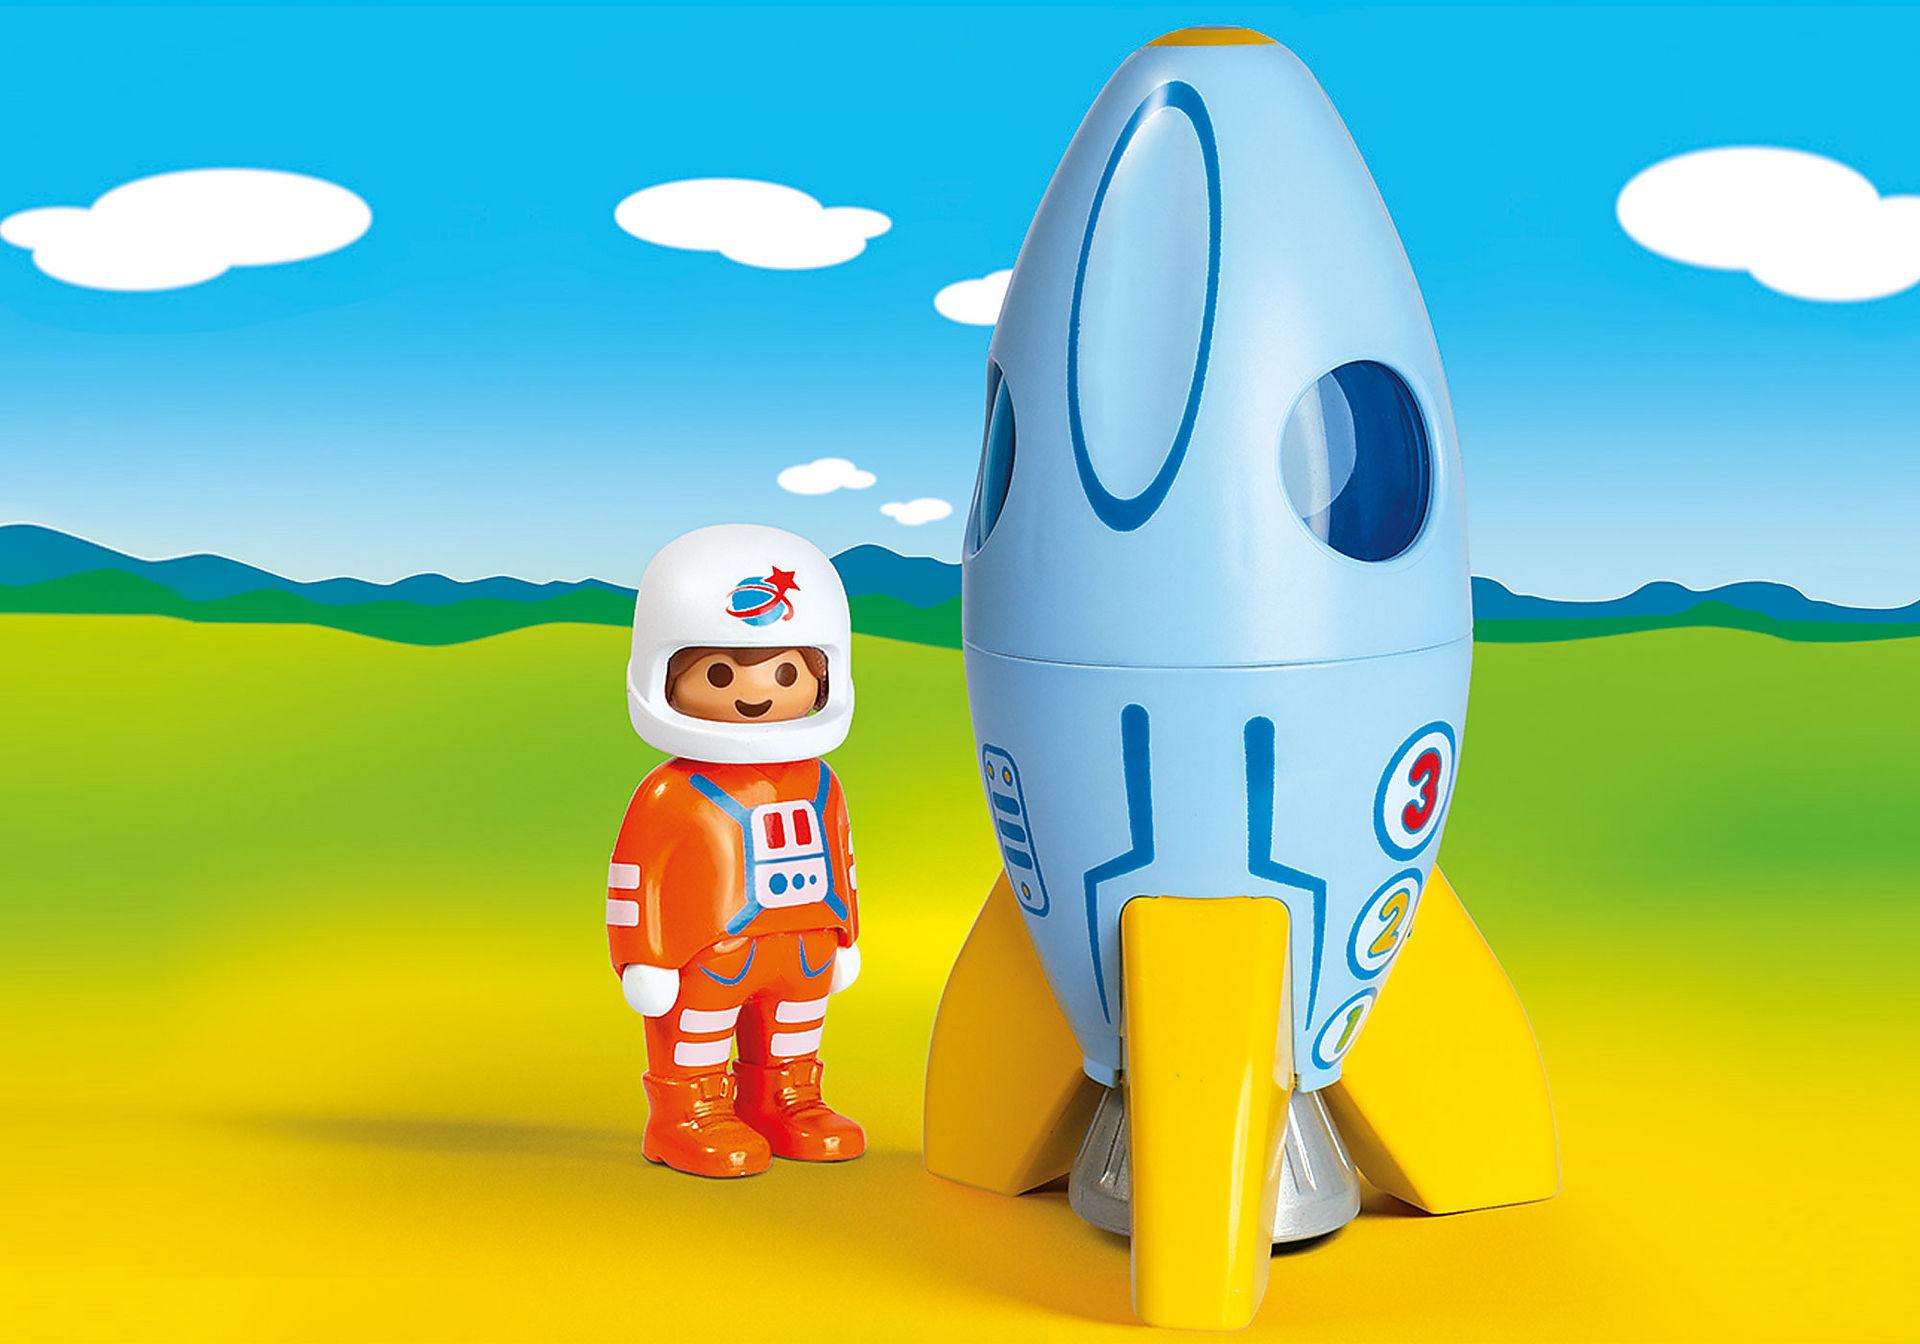 70186 1.2.3 Astronauta con Cohete zoom image1